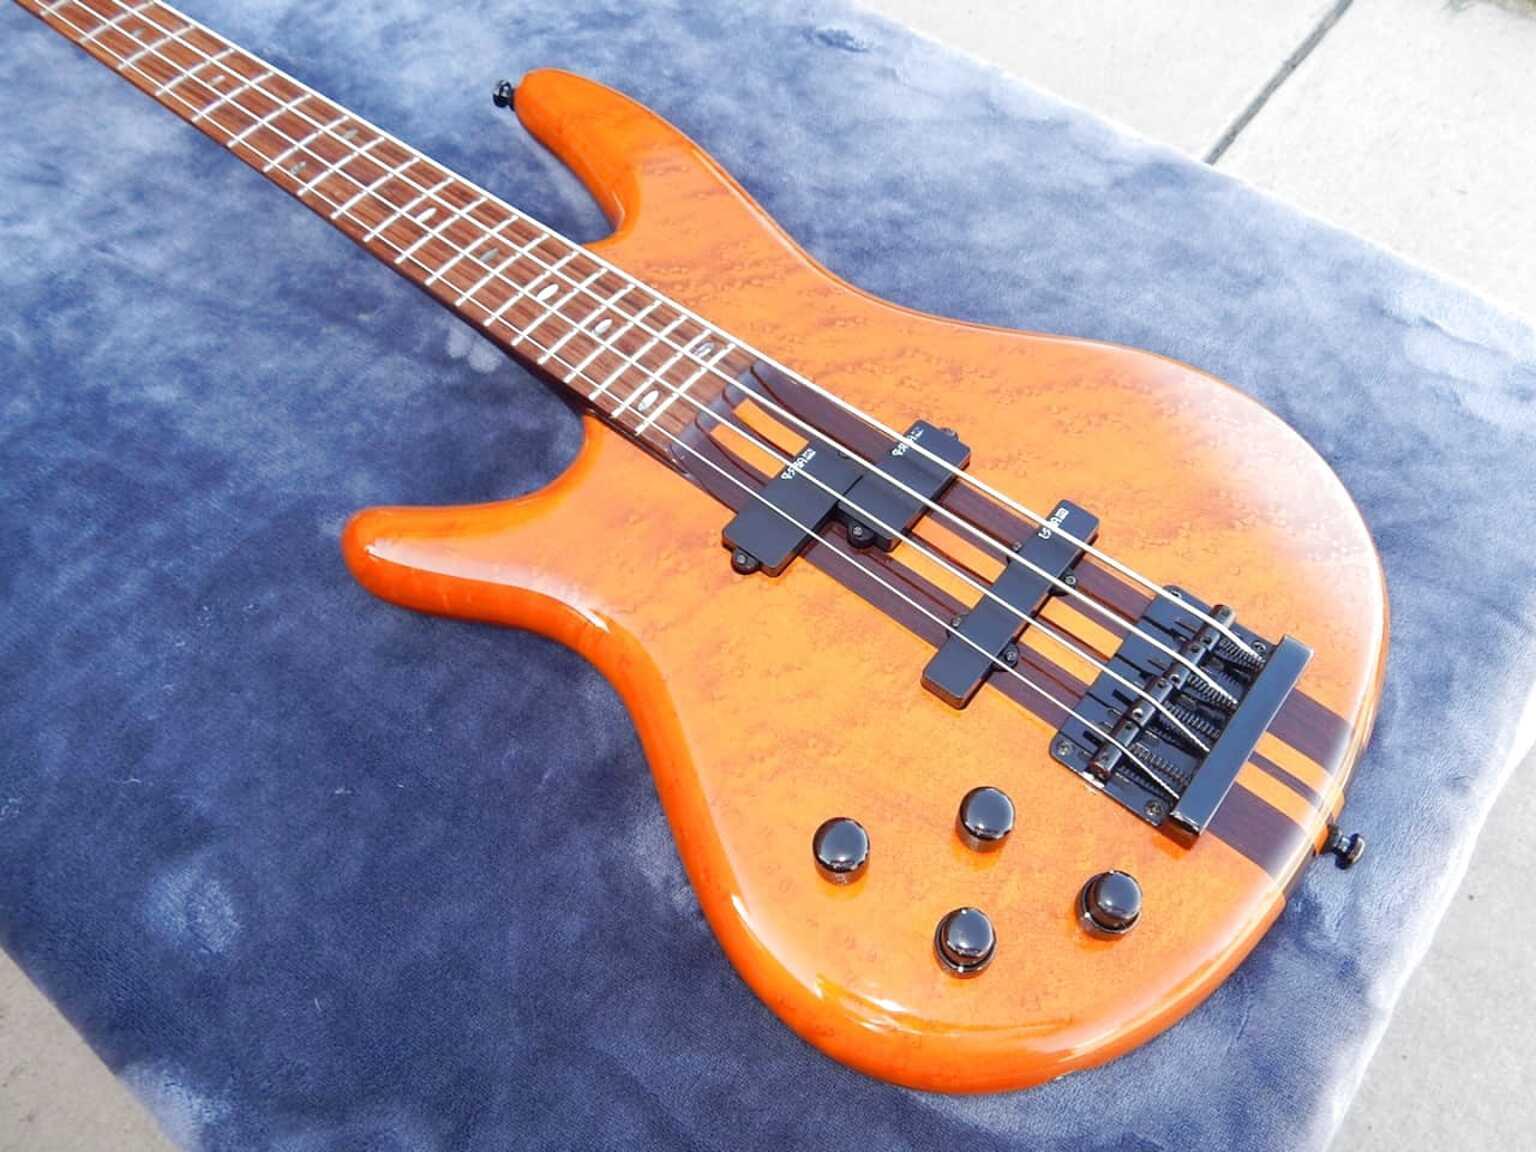 ibanez soundgear bass for sale